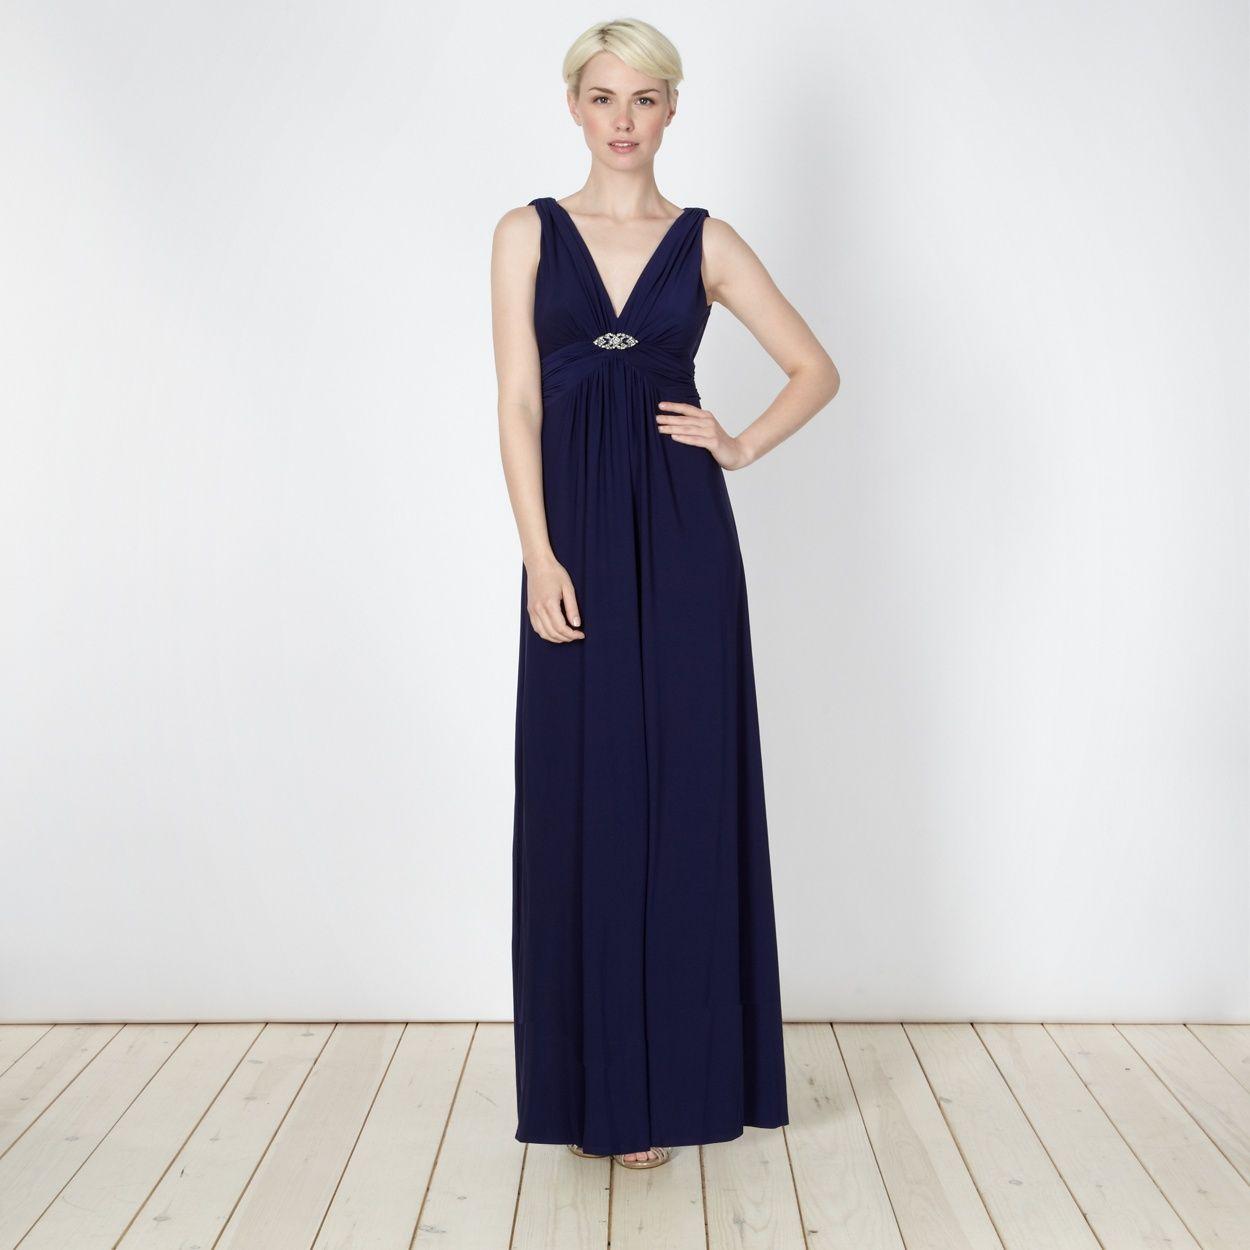 Debut dark blue jersey maxi dress at debenhams big wedding debut dark blue jersey maxi dress at debenhams rustic wedding gownswedding ombrellifo Choice Image